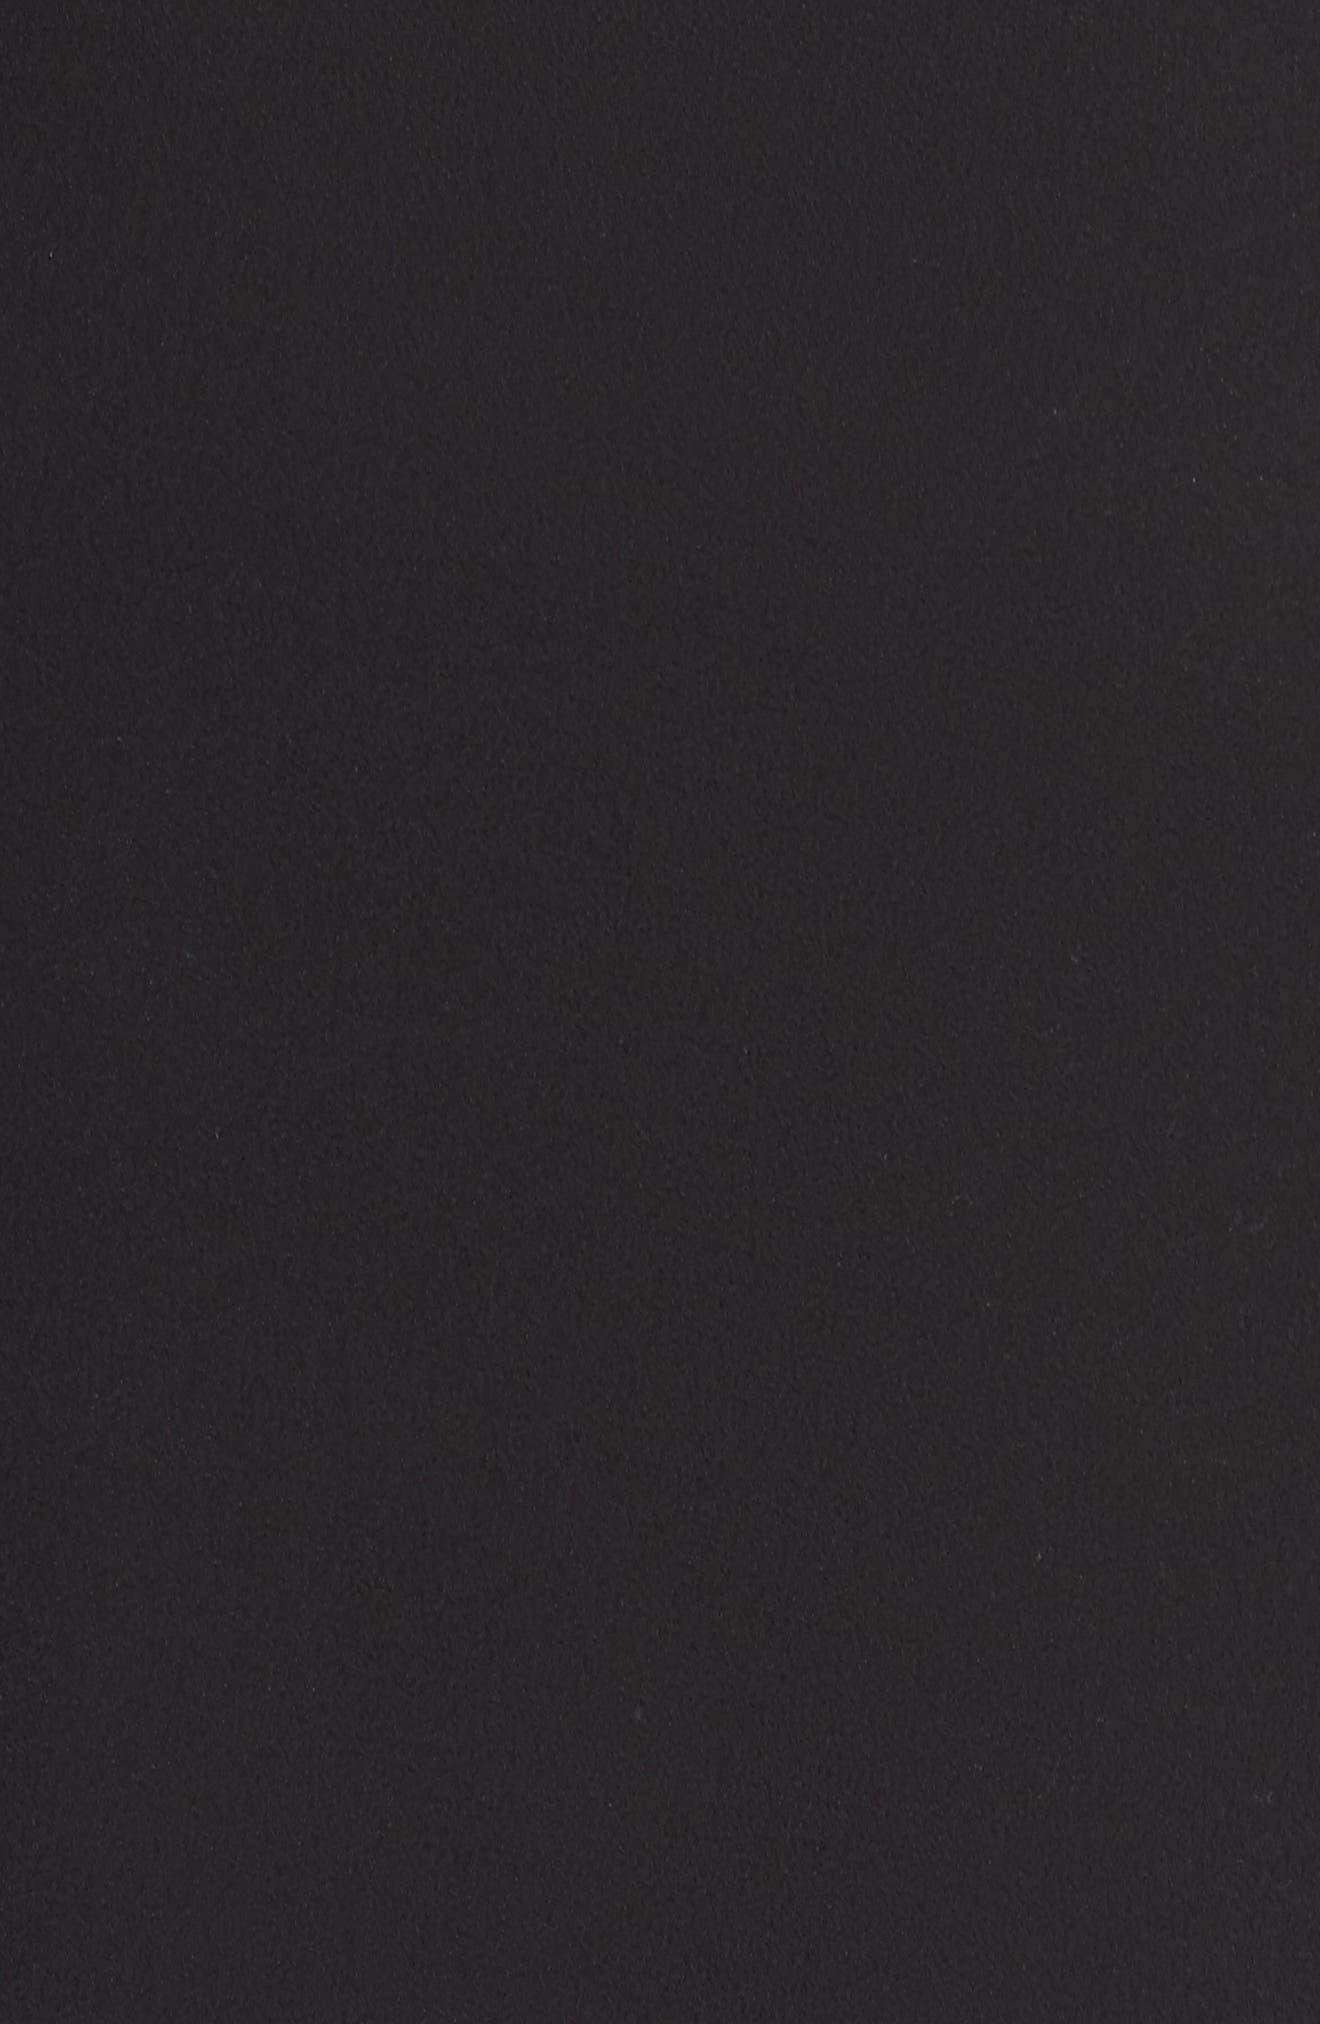 Bell Sleeve Ruffle Hem Blouse,                             Alternate thumbnail 5, color,                             Black